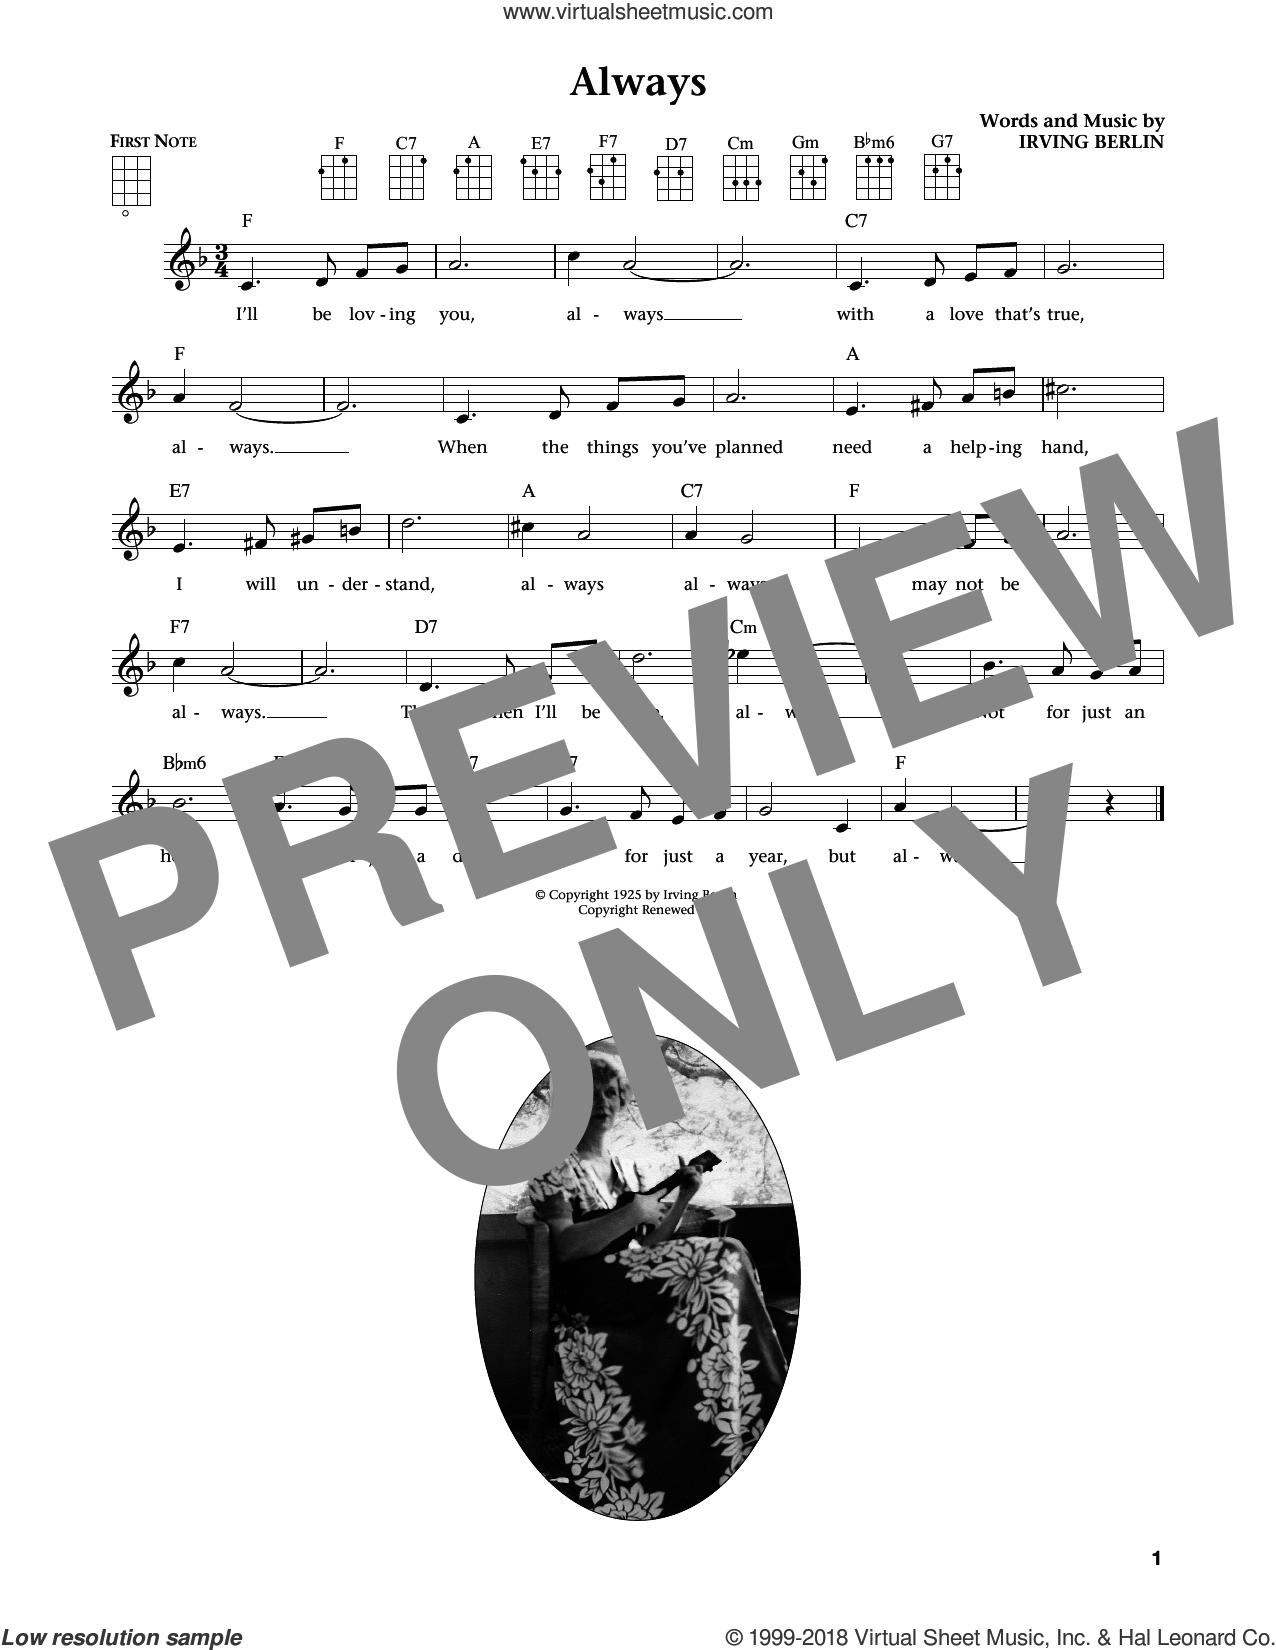 Always (from The Daily Ukulele) (arr. Liz and Jim Beloff) sheet music for ukulele by Irving Berlin, Jim Beloff and Liz Beloff, intermediate skill level